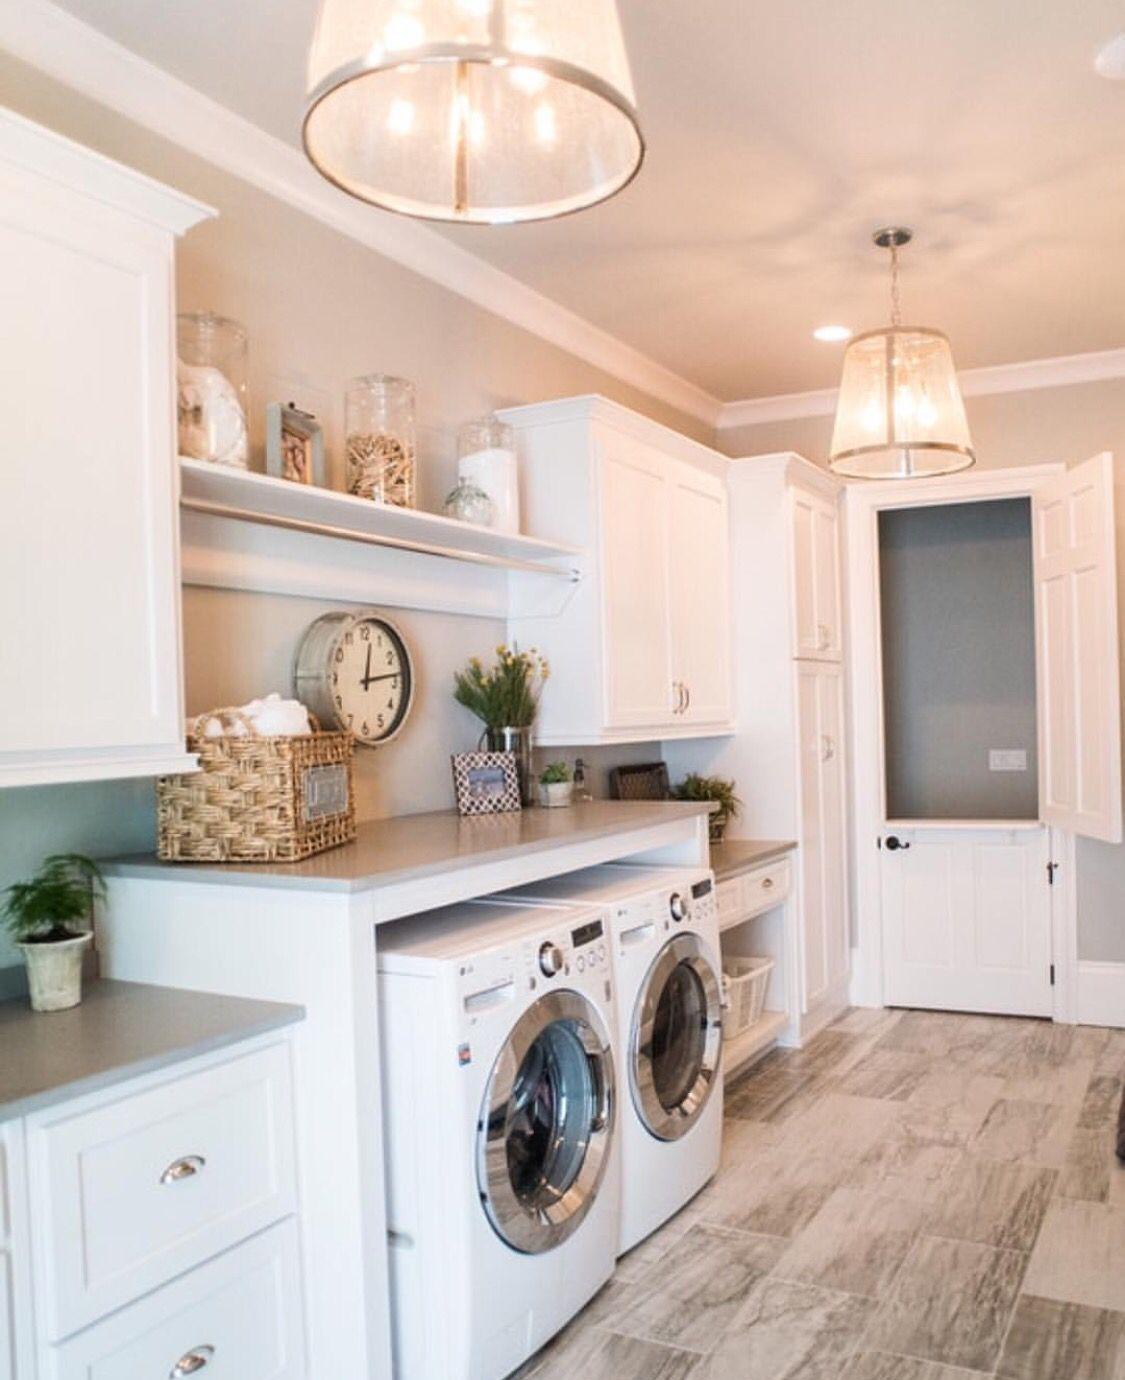 Laundry Room My Home Ideas Pinterest Lavar Casas Y Interiores